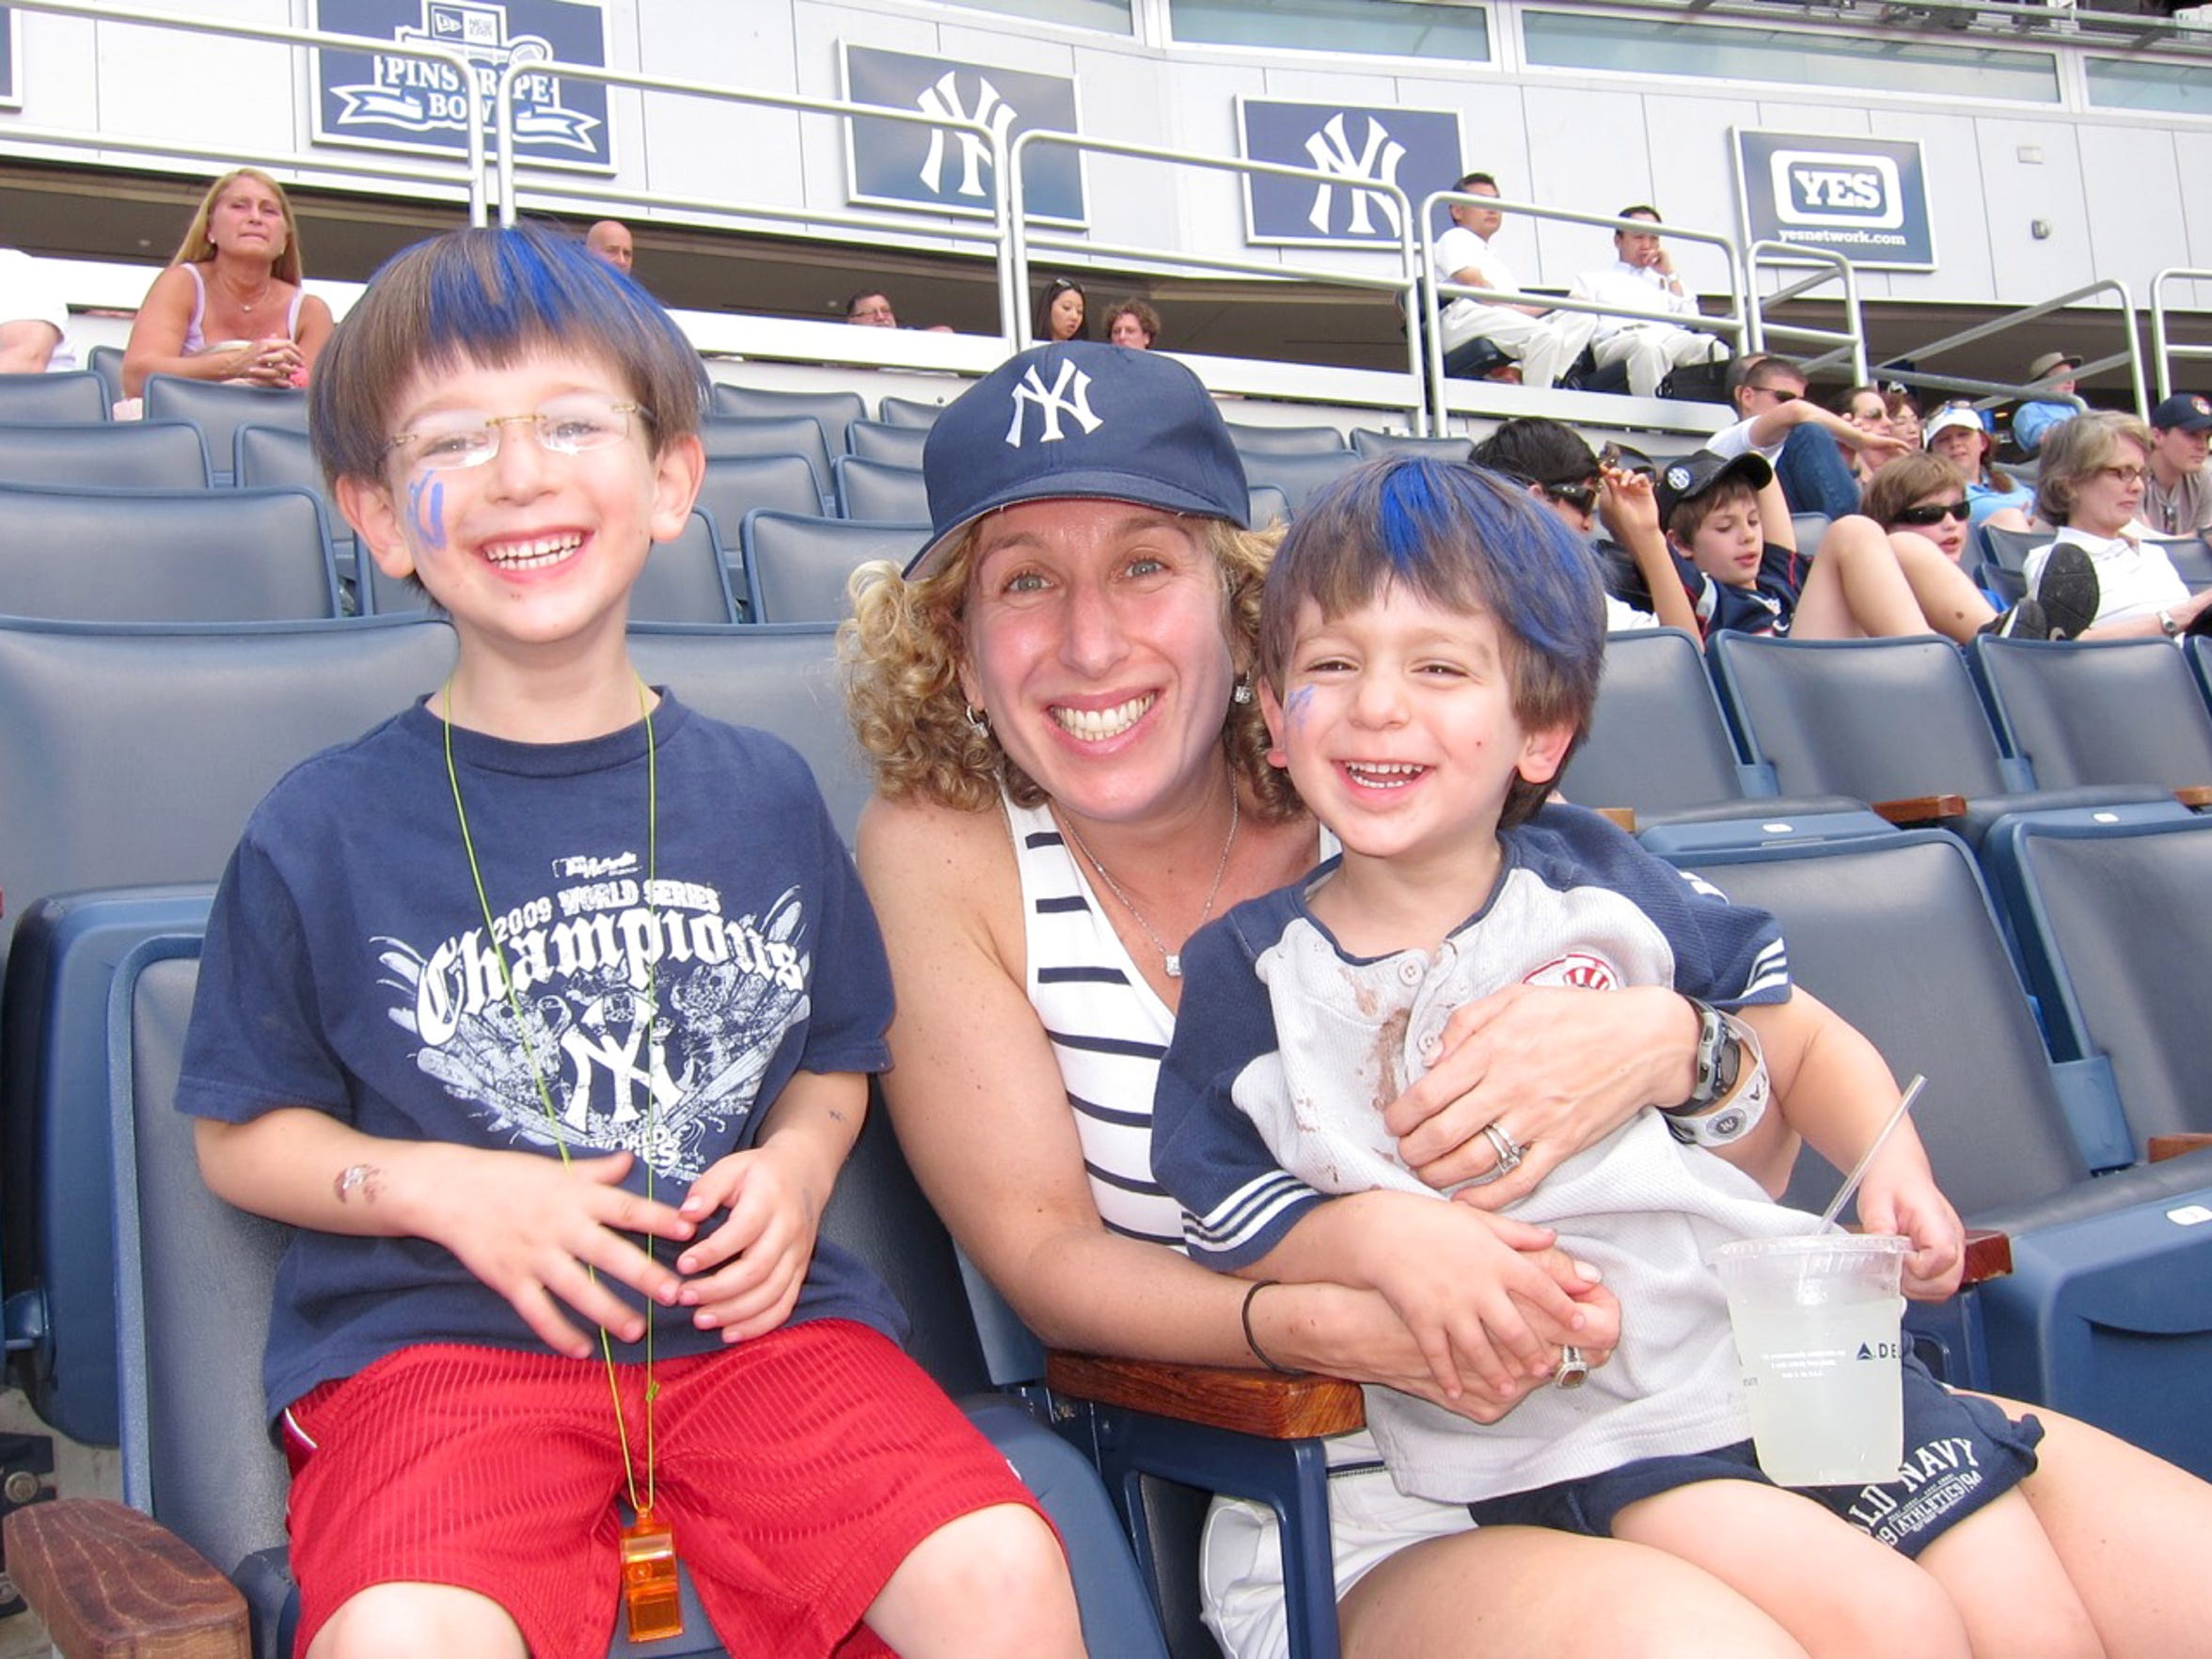 At a Yankee's game.